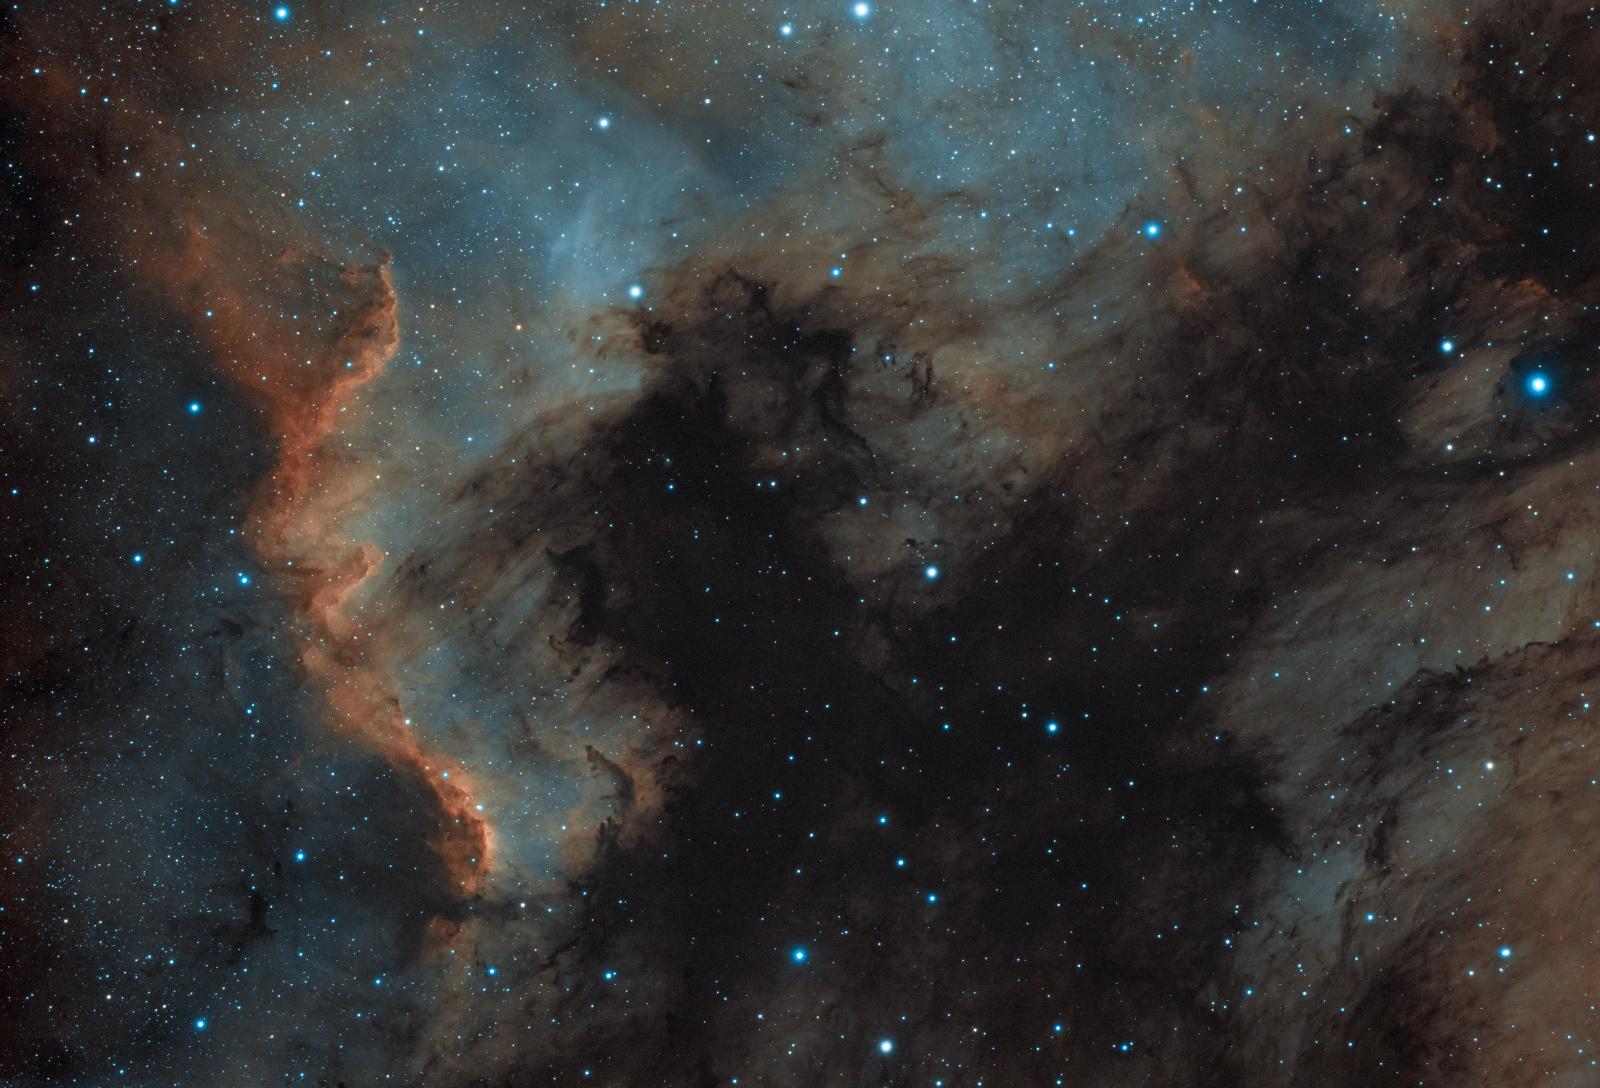 combine-RGB-image-St-ps.jpg